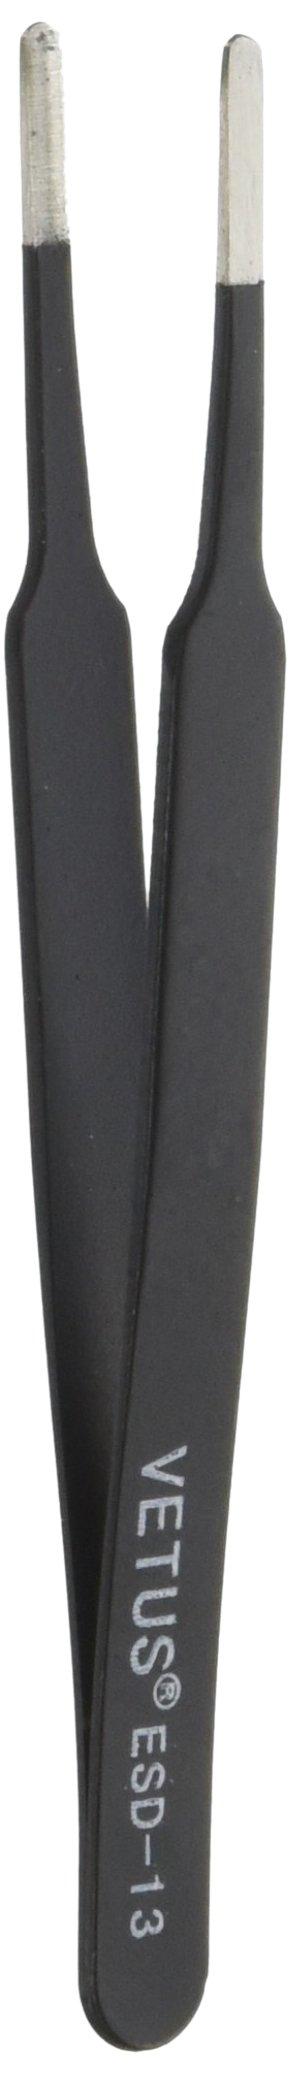 Vetus Pro ESD Safe Flat Round Tip Straight Tweezers - ESD-13